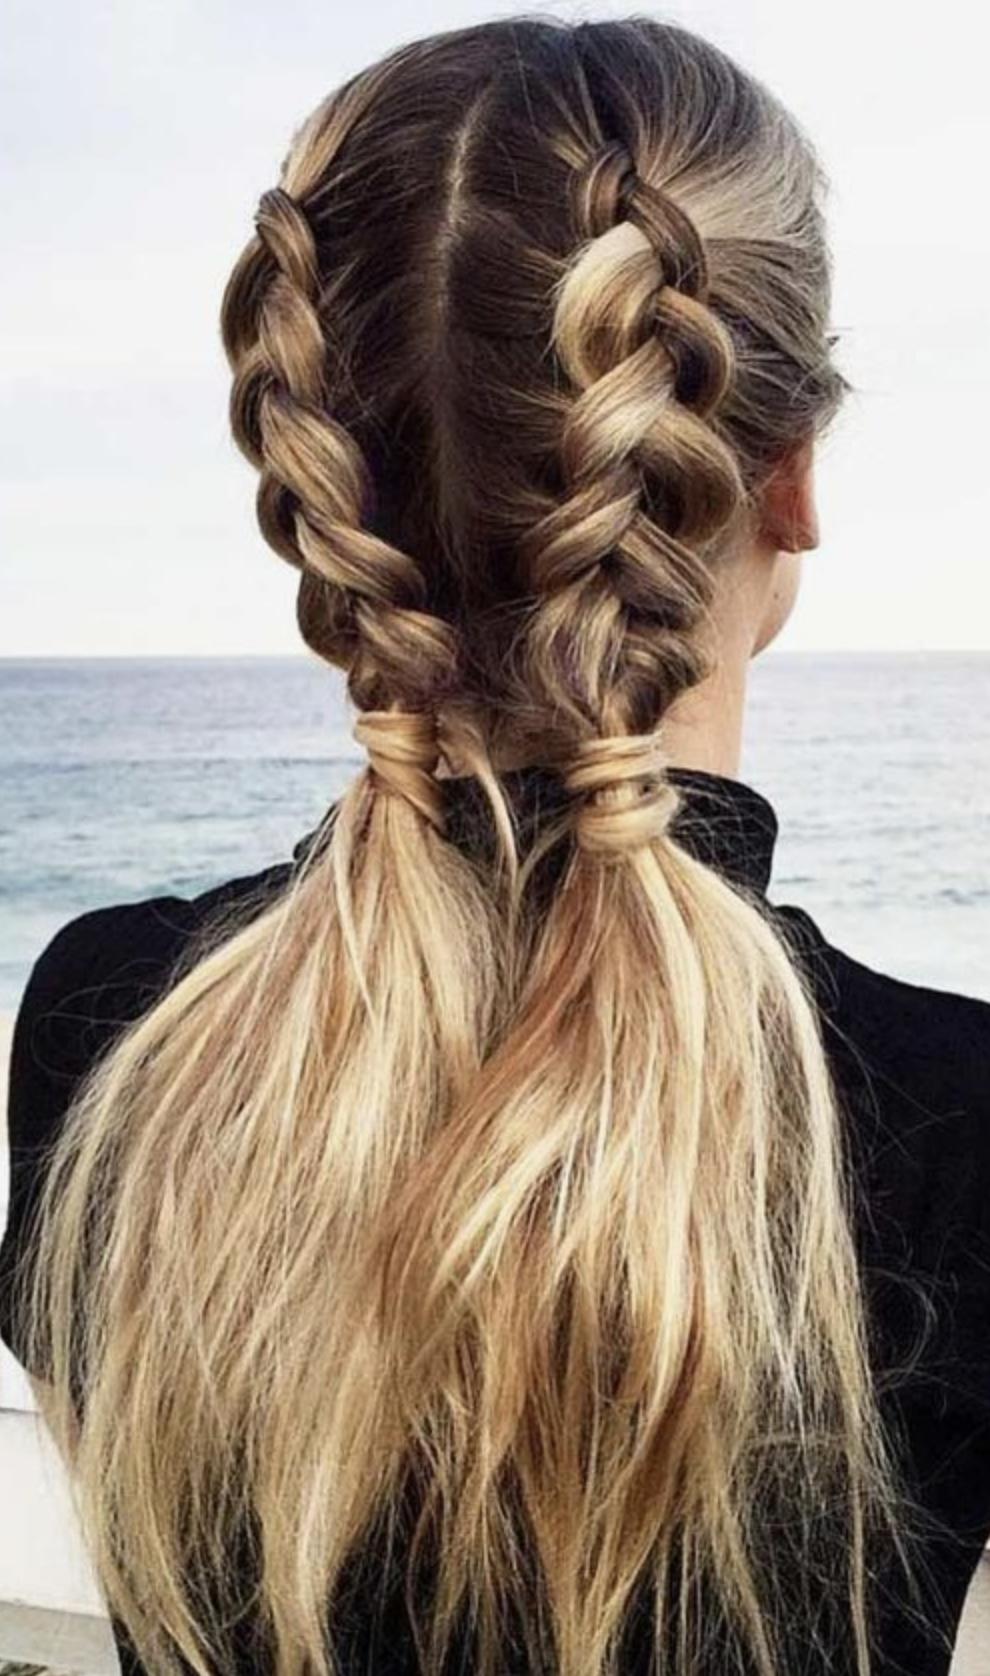 Pin by rachelle elvord on beautiful pinterest hair style hair